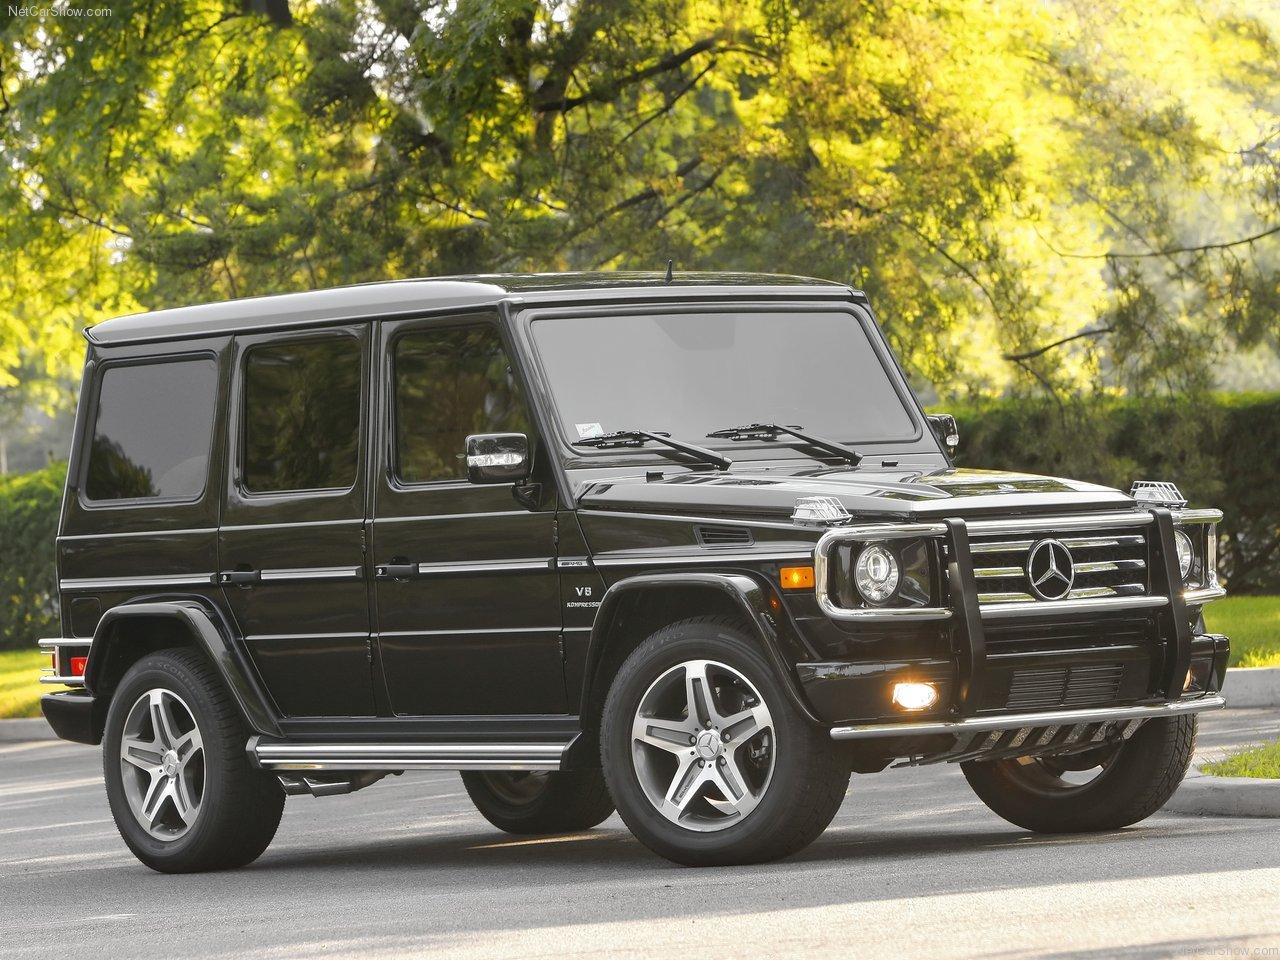 http://3.bp.blogspot.com/-SWcpVkji2Oo/TWssd3ryIQI/AAAAAAACLaE/Qx1LYgniR50/s1600/Mercedes-Benz-G55_AMG_2009_1280x960_wallpaper_07.jpg